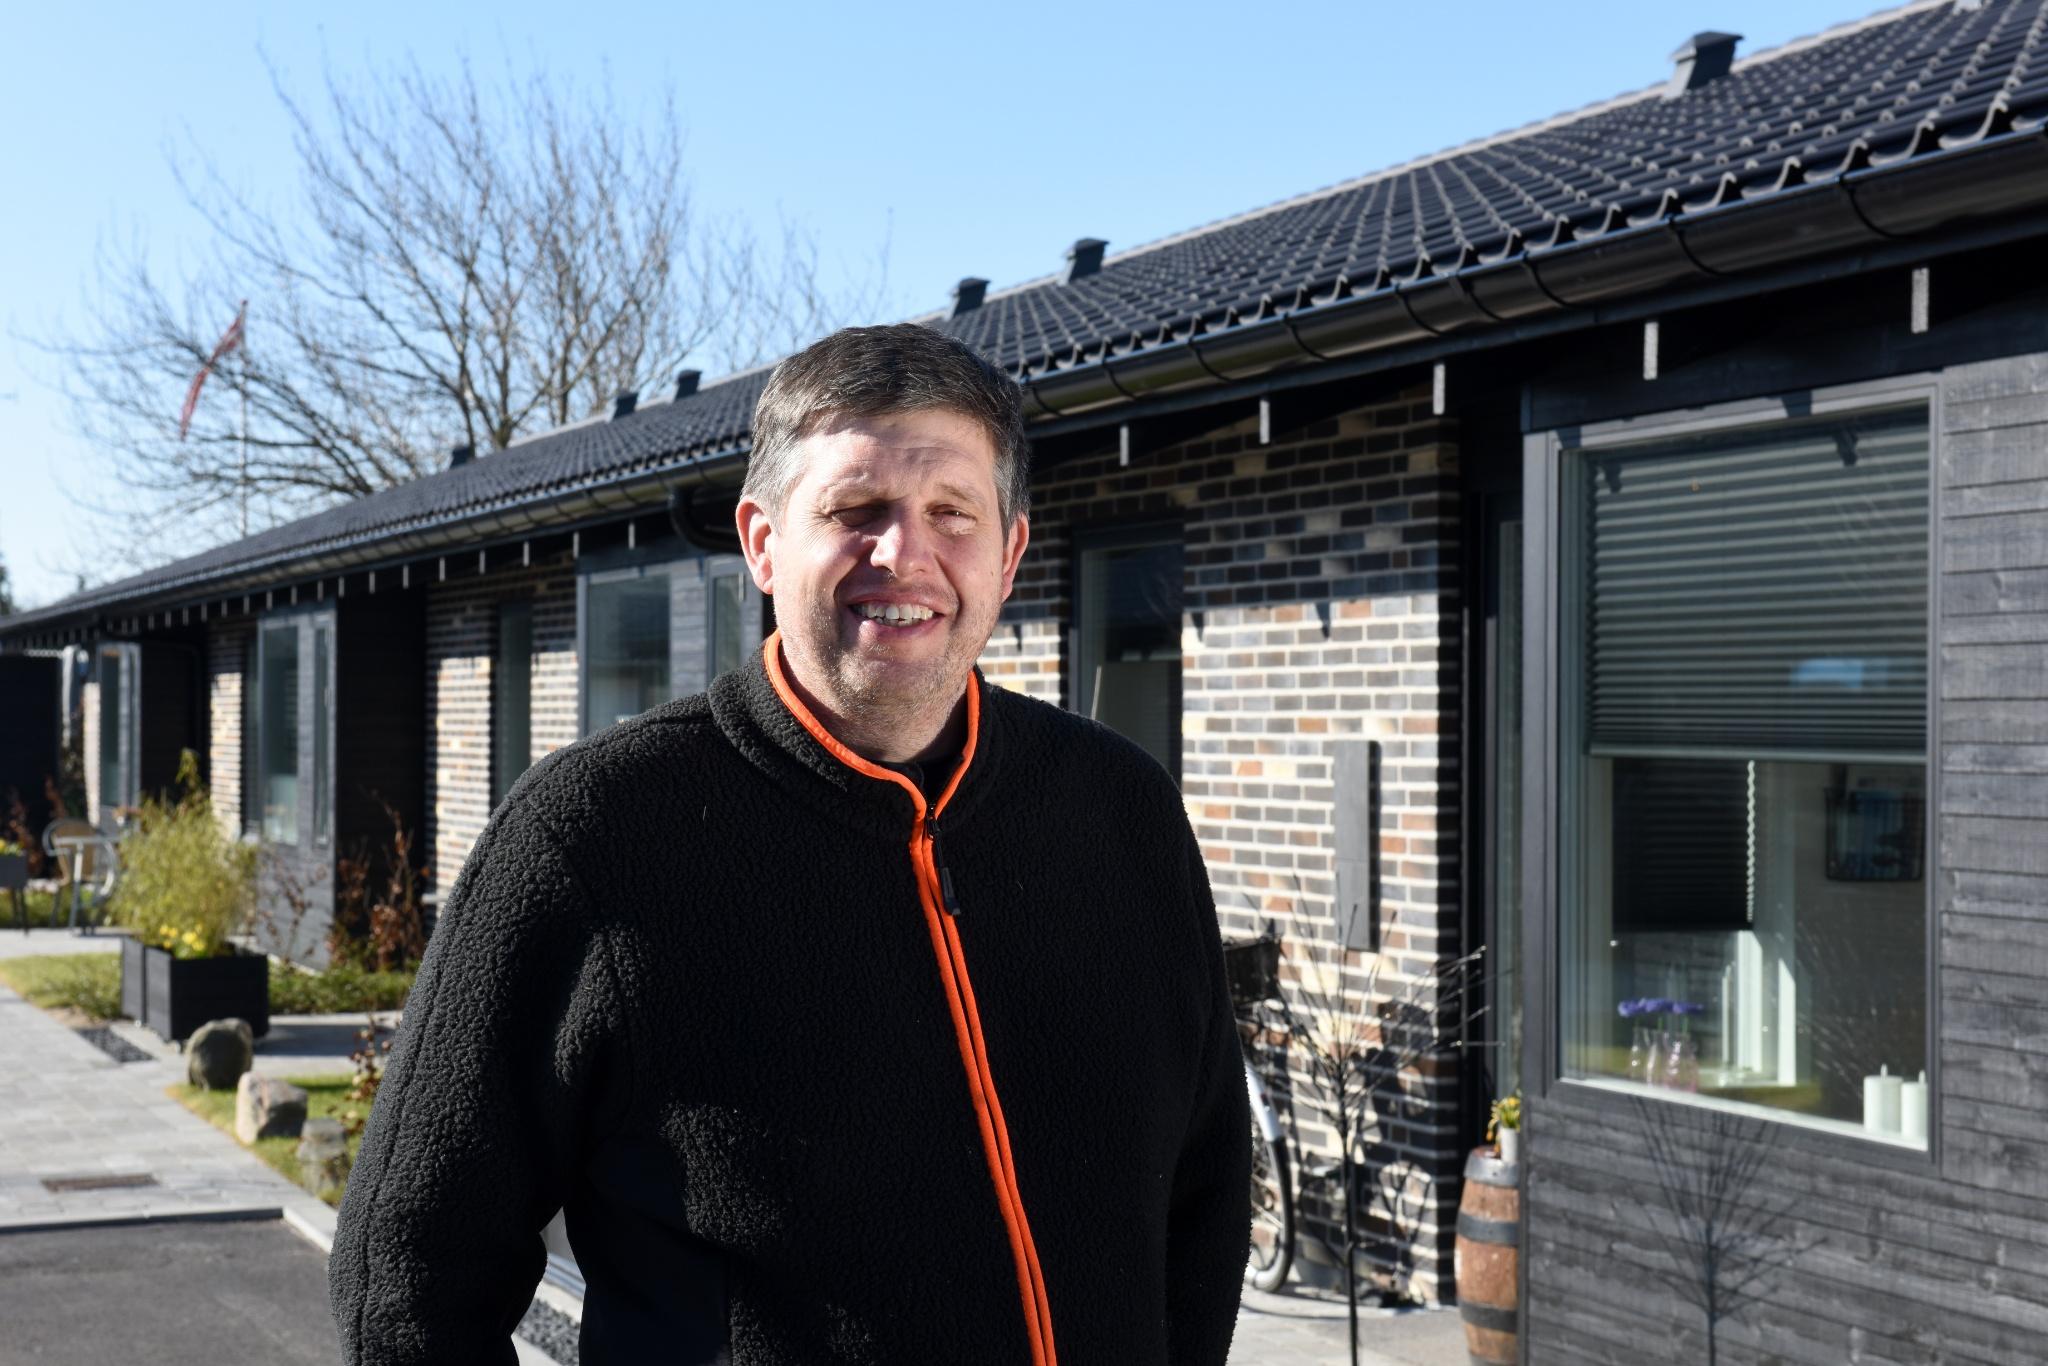 Karsten Vestergaard